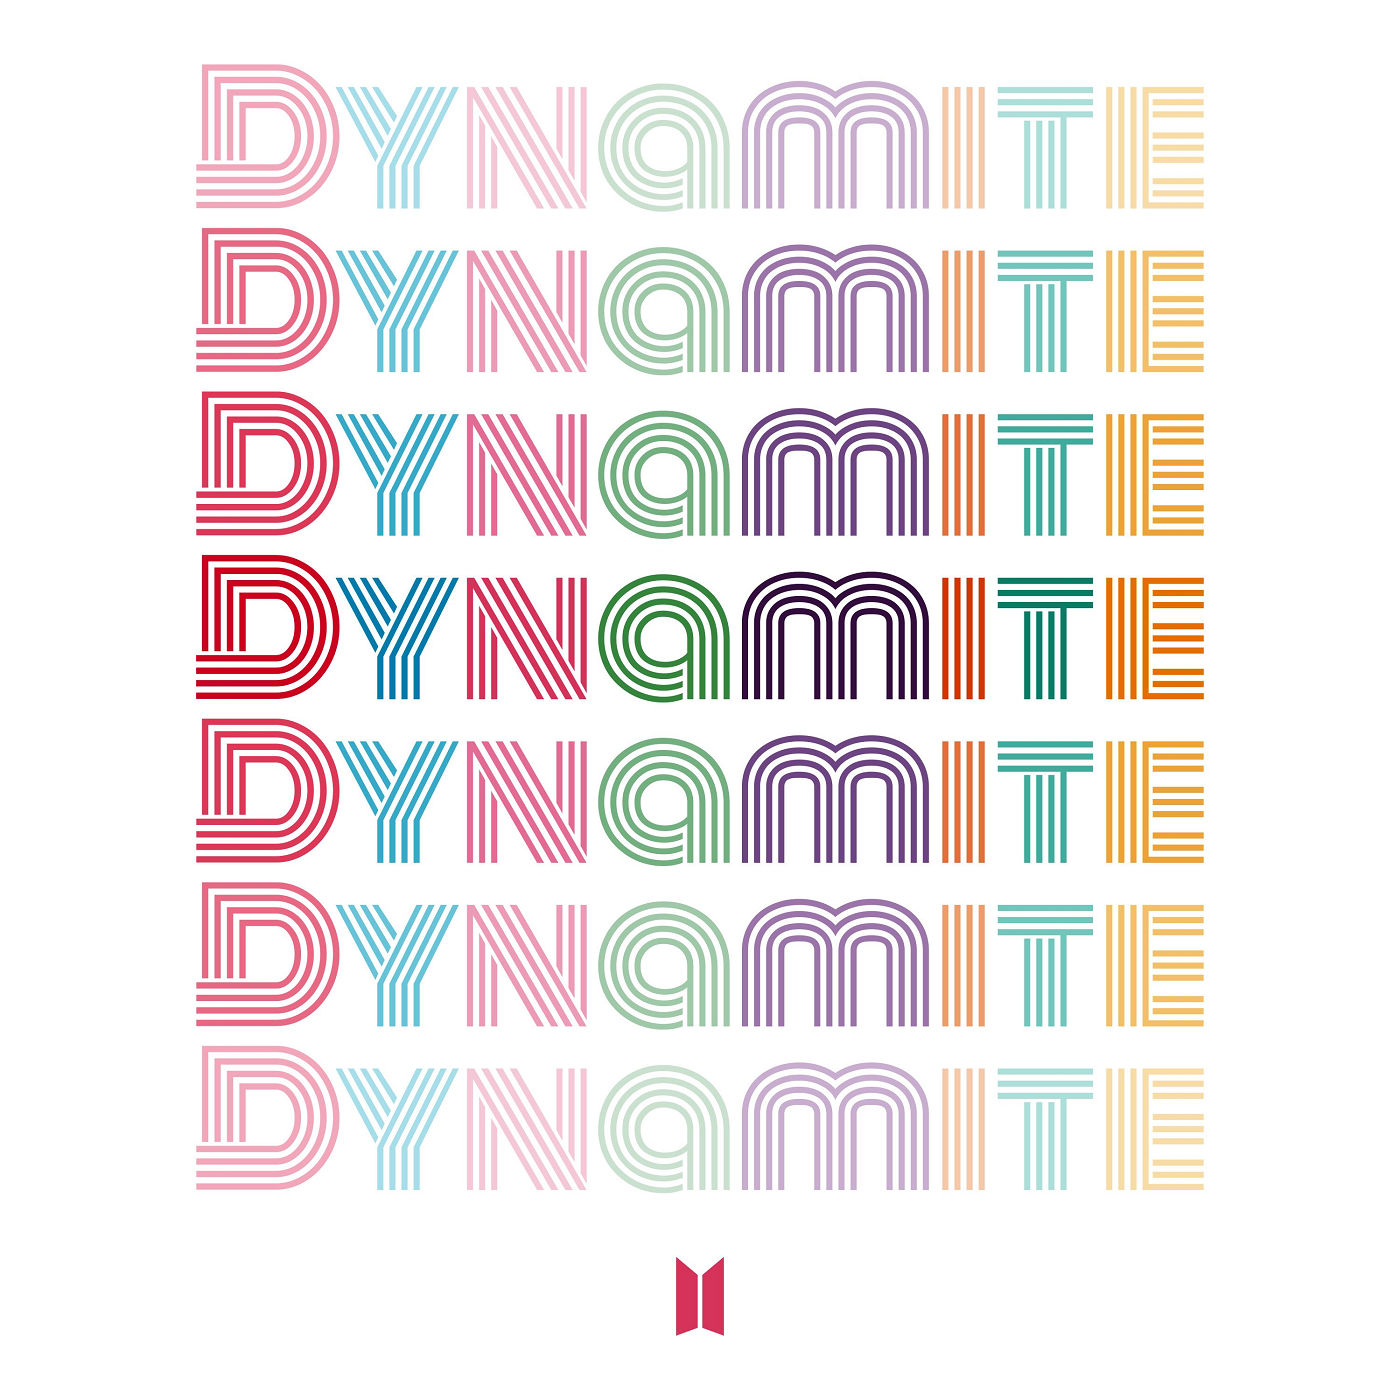 Dynamite (BTS) | Kpop Wiki